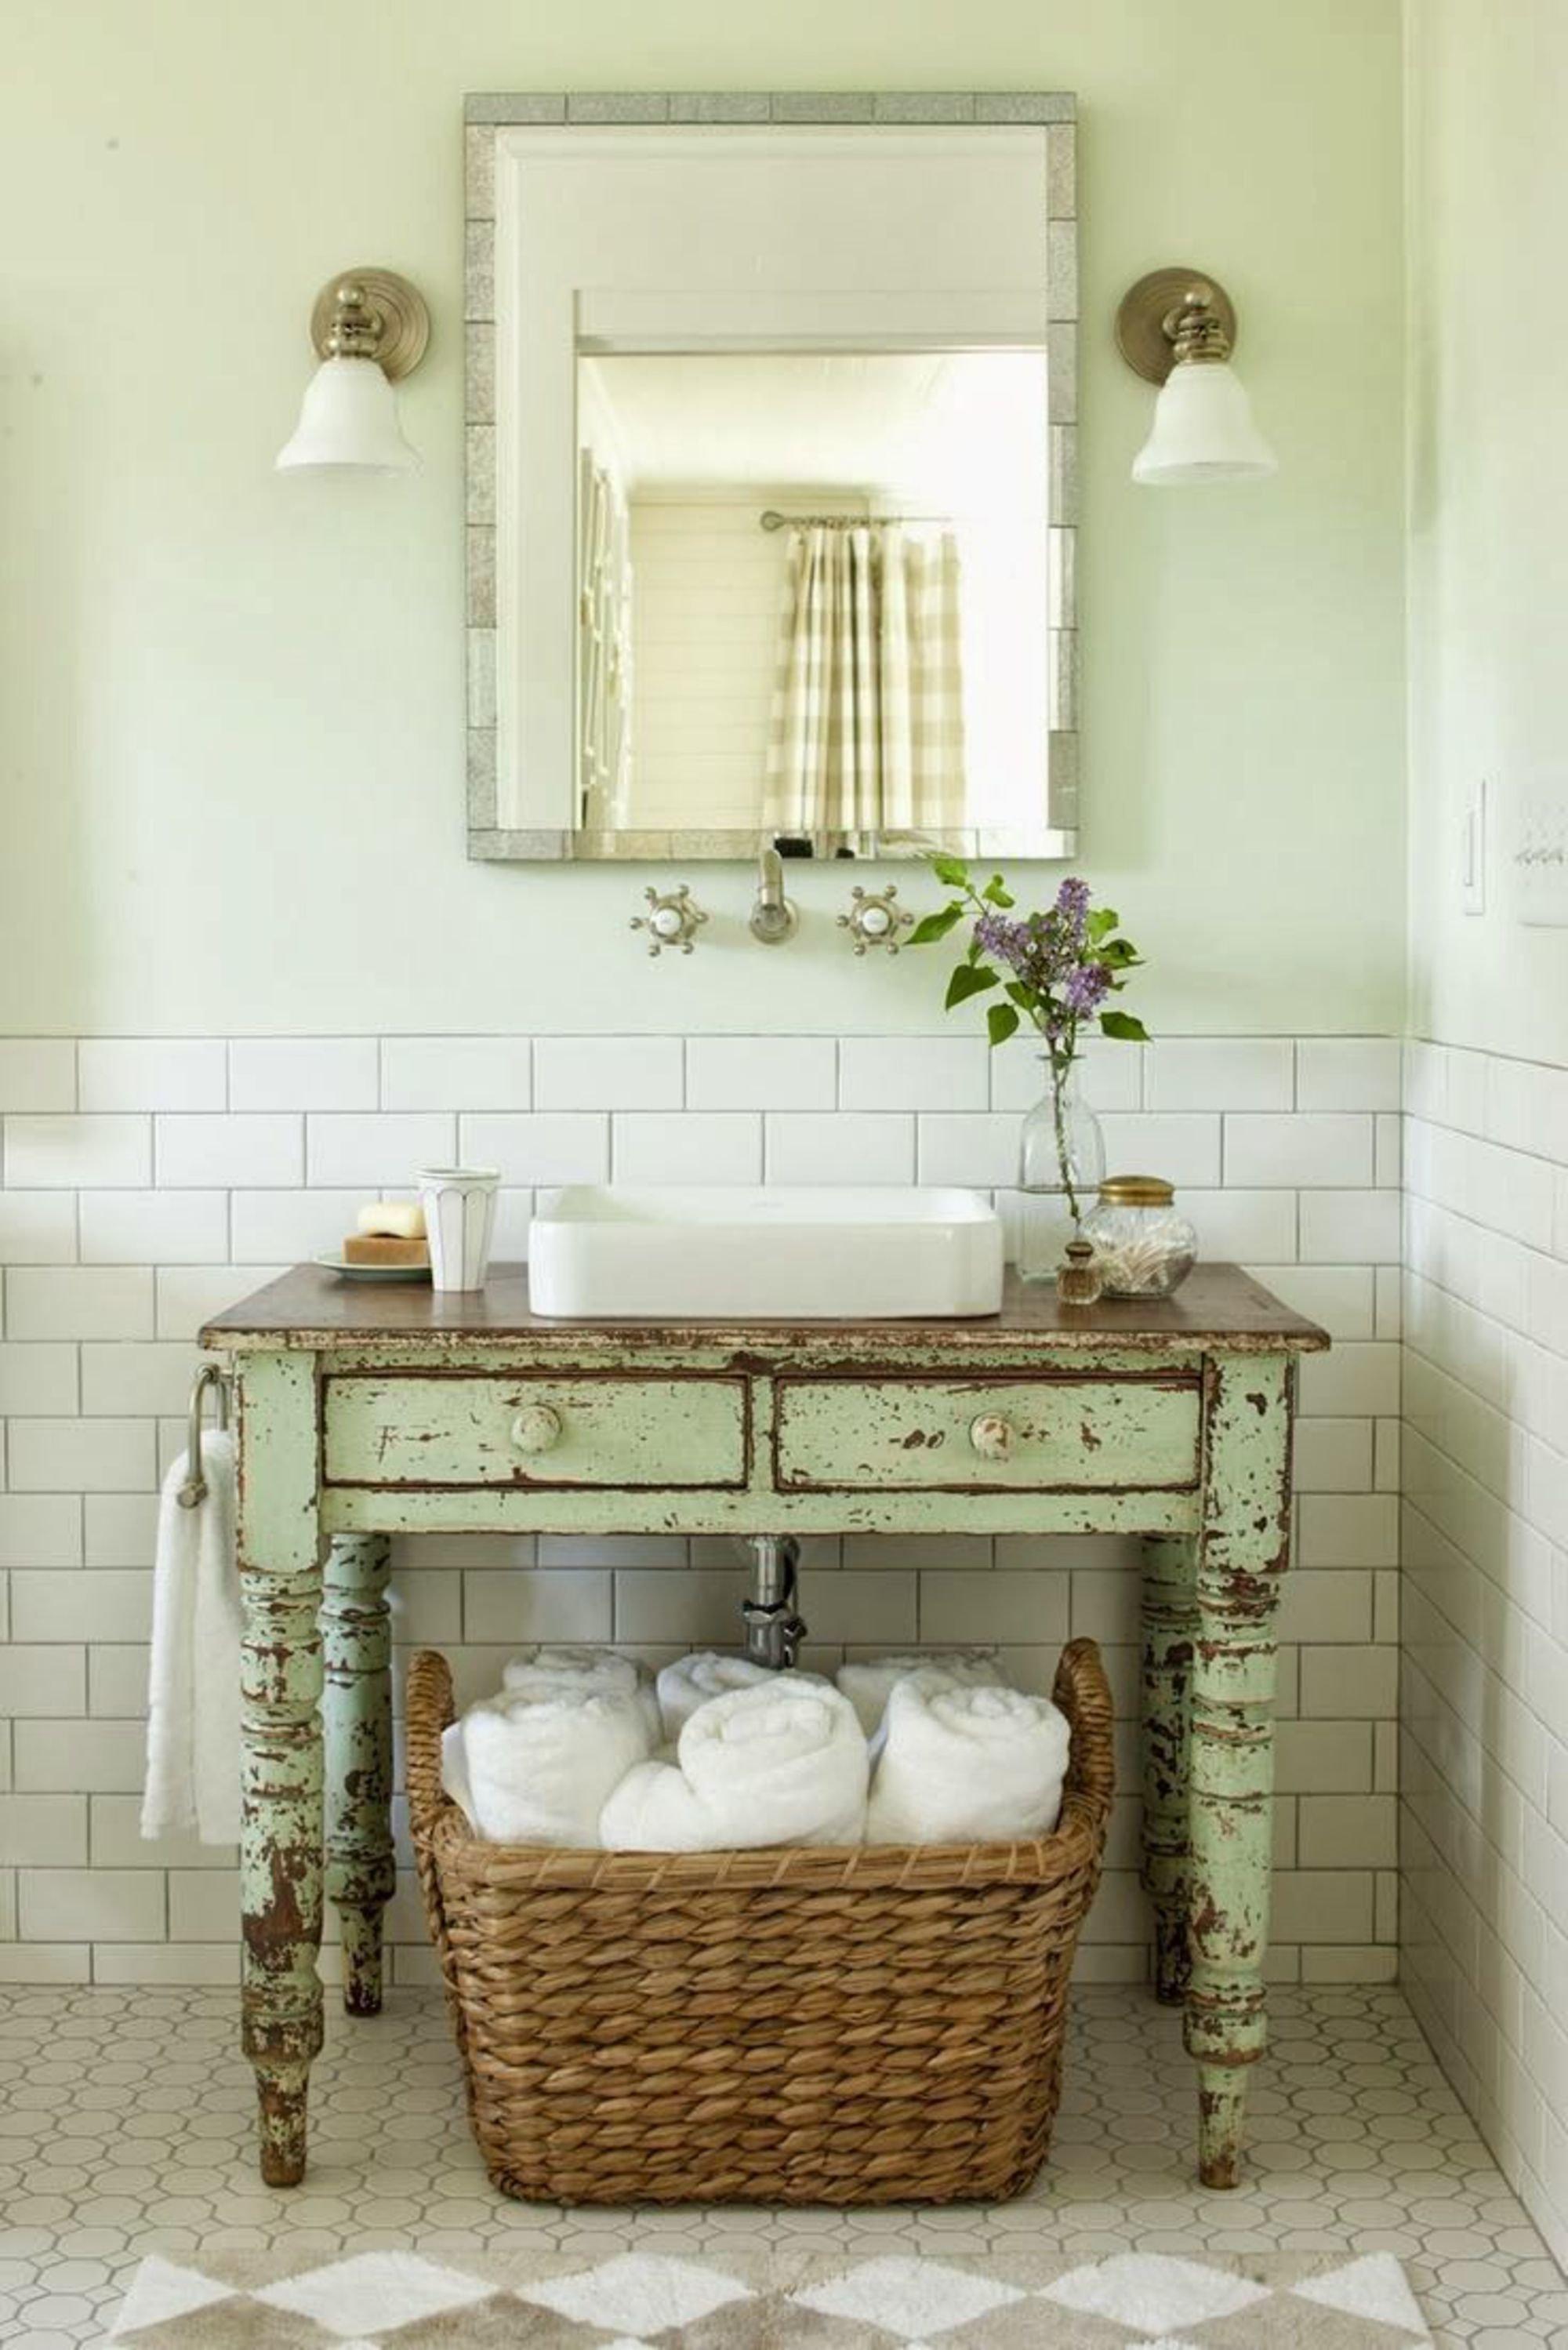 Salle de bain vintage vert blanc beige carrelage faïence miroir bois ...